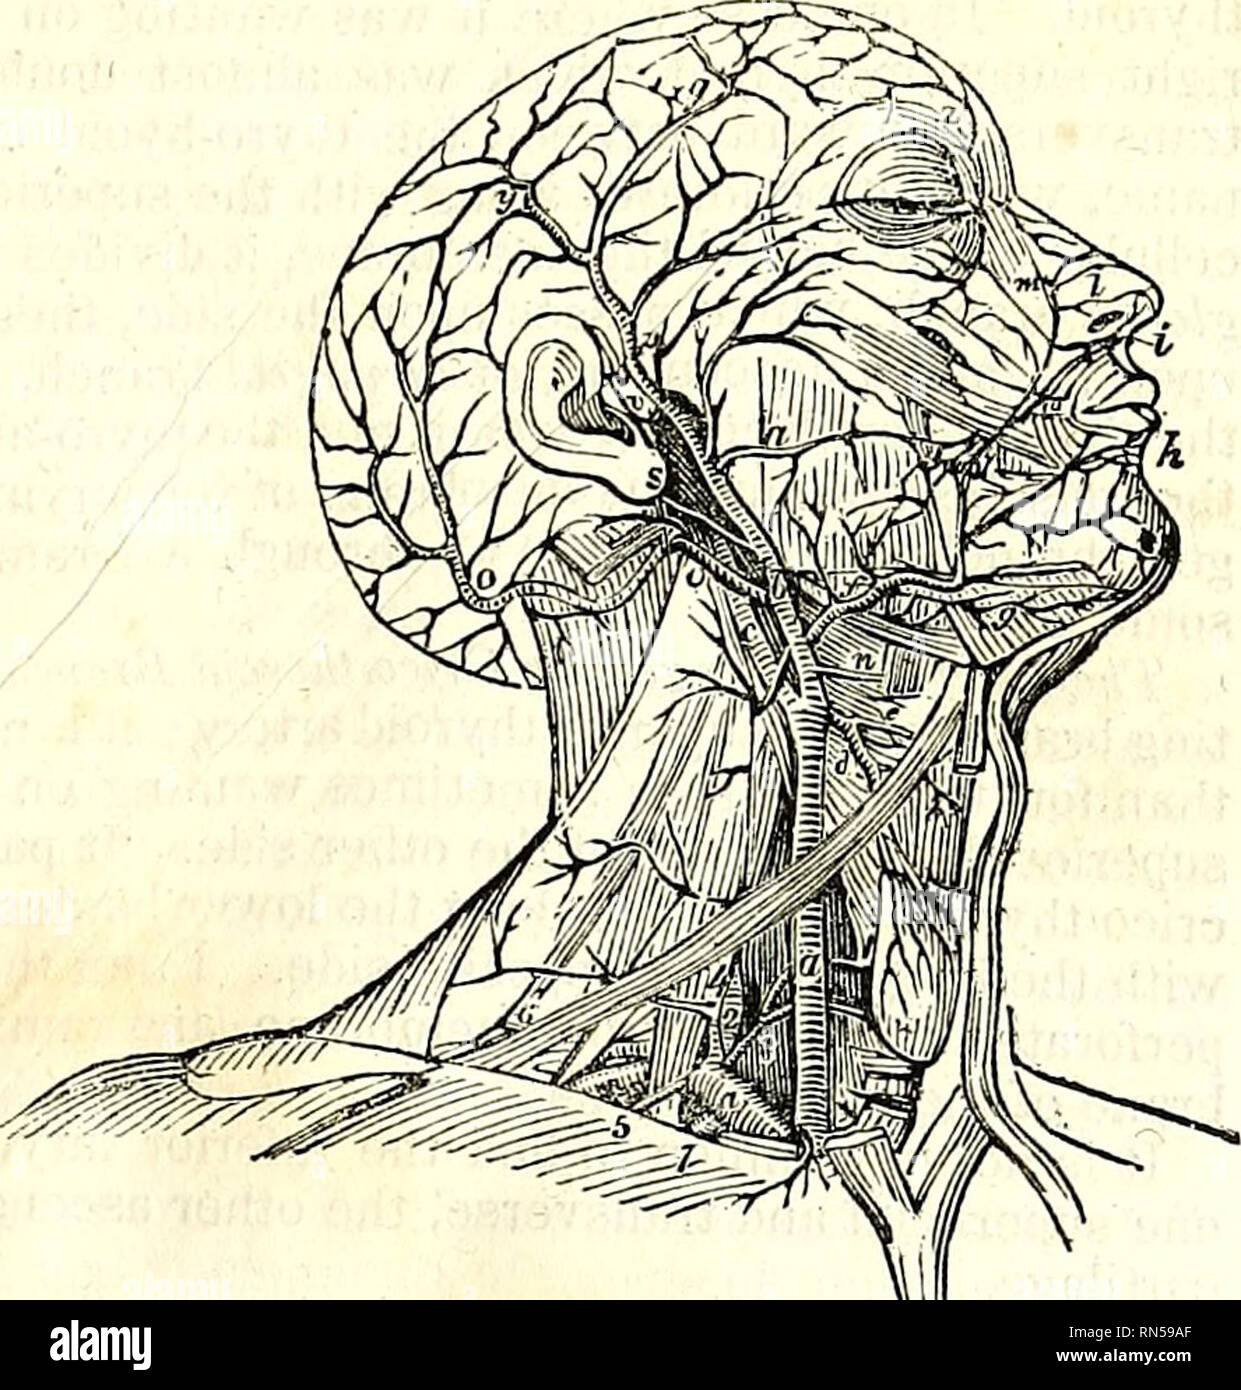 The Anatomy Of The Human Body Human Anatomy Anatomy The External